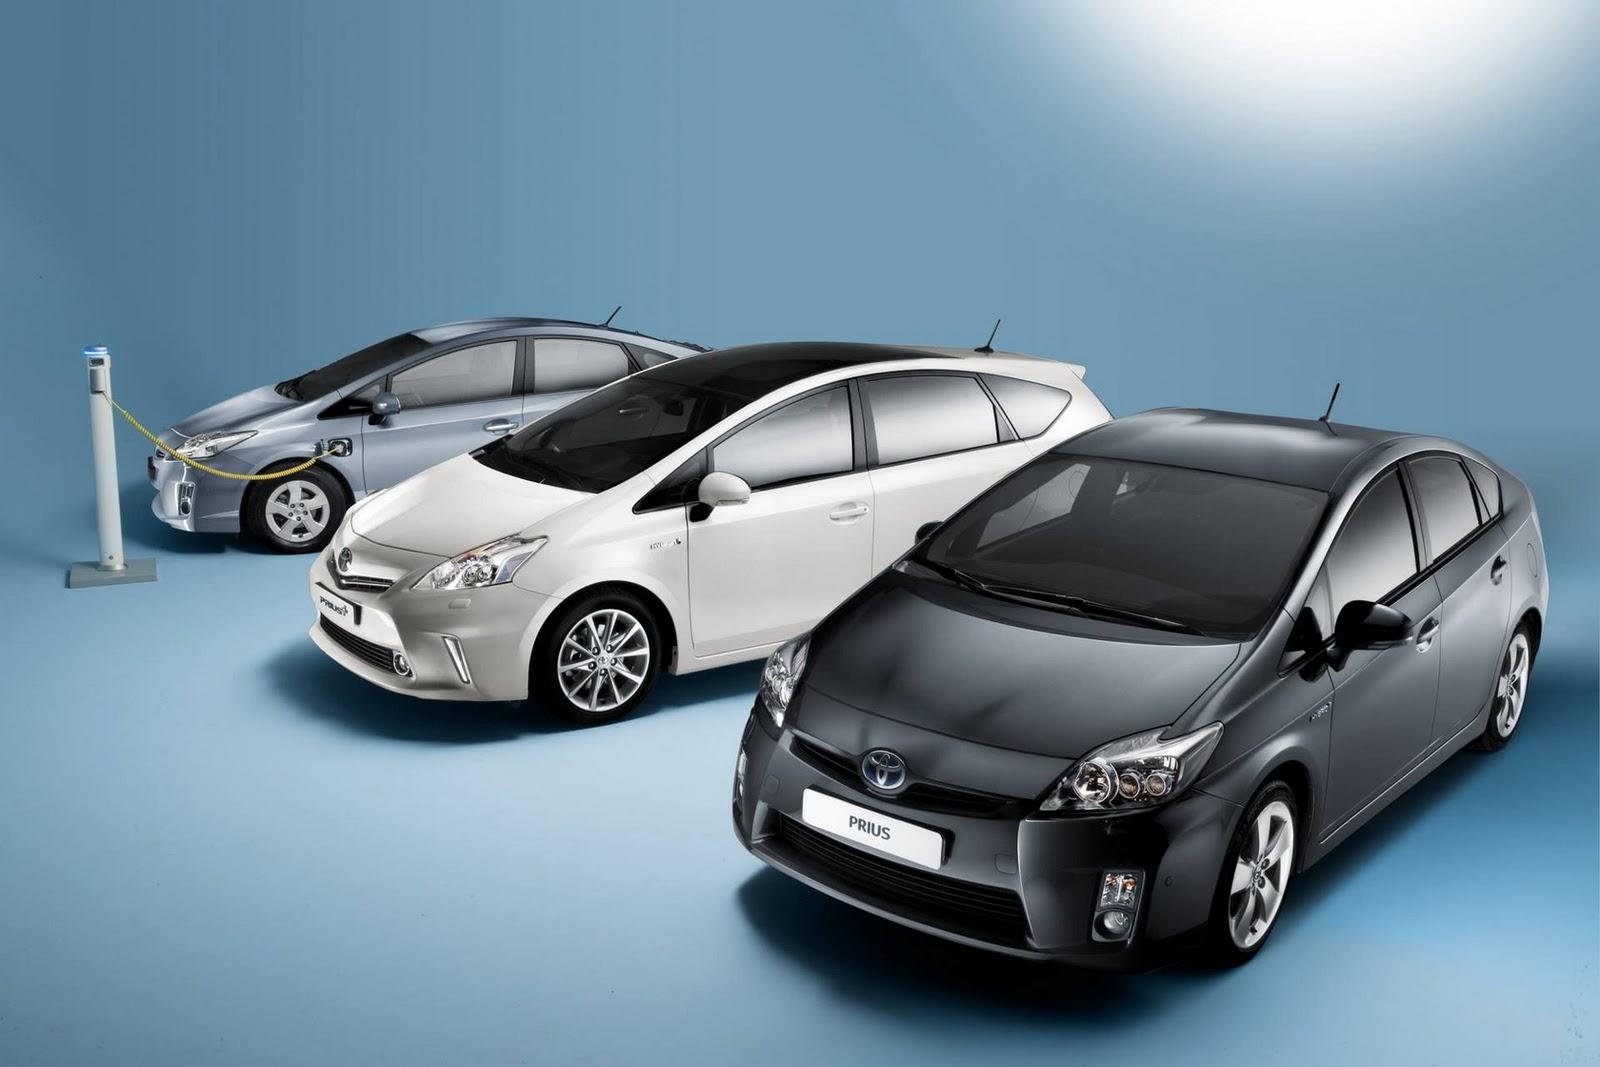 http://4.bp.blogspot.com/-5w5lkhfFhxU/TyaMR5i8URI/AAAAAAAAABM/k47_-XArLII/s1600/Toyota-Prius-MPV-wallpaper.jpg